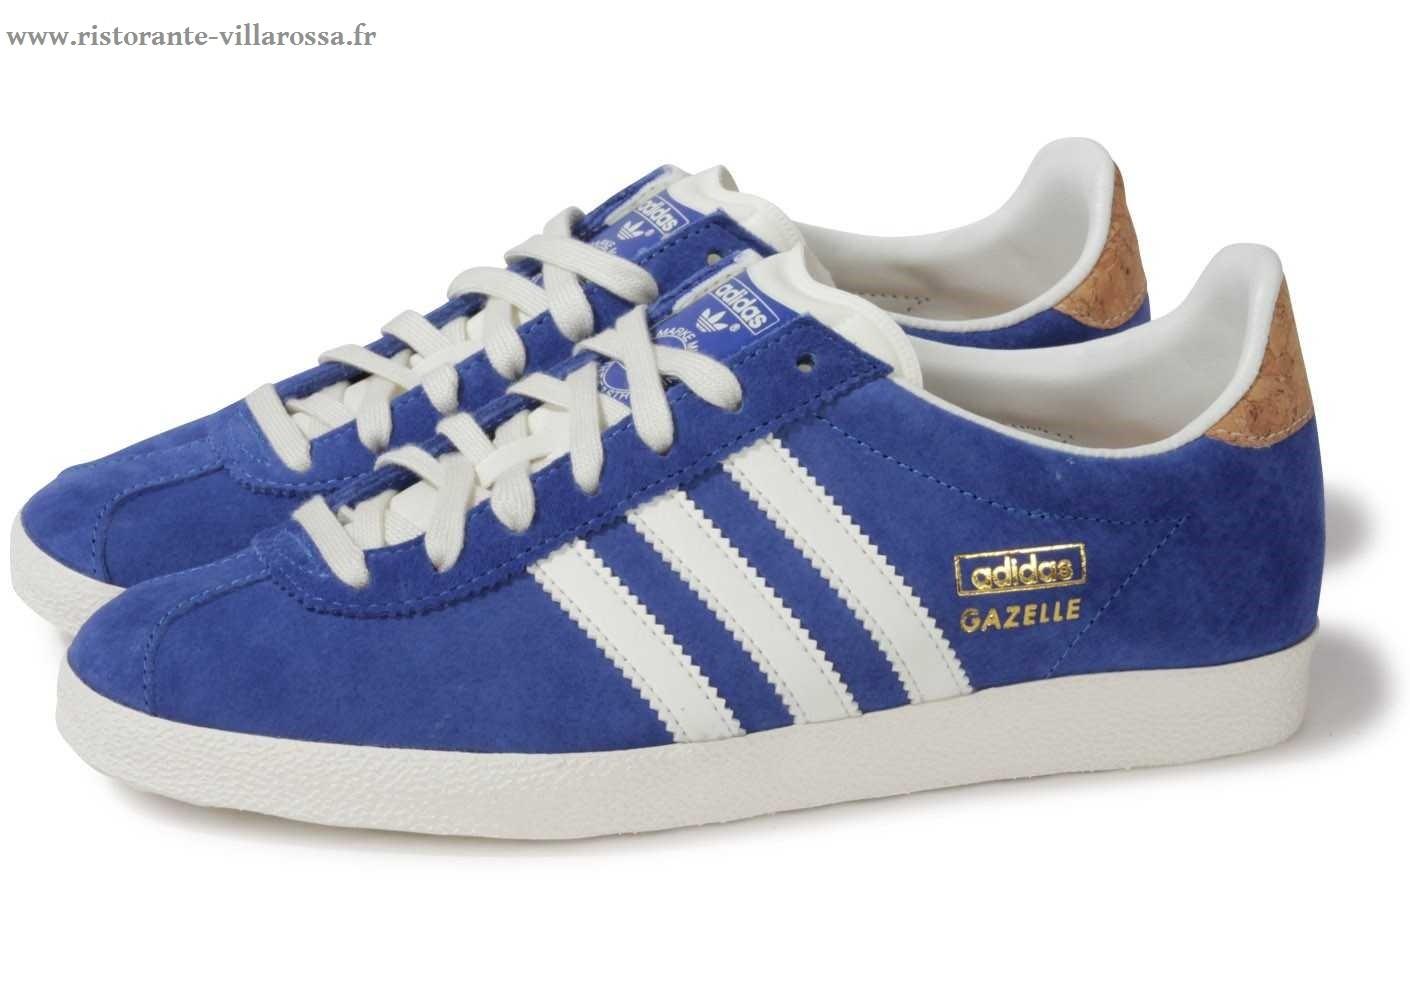 Adidas Baskets basses Gazelle Femme Bleu marine gl19625a